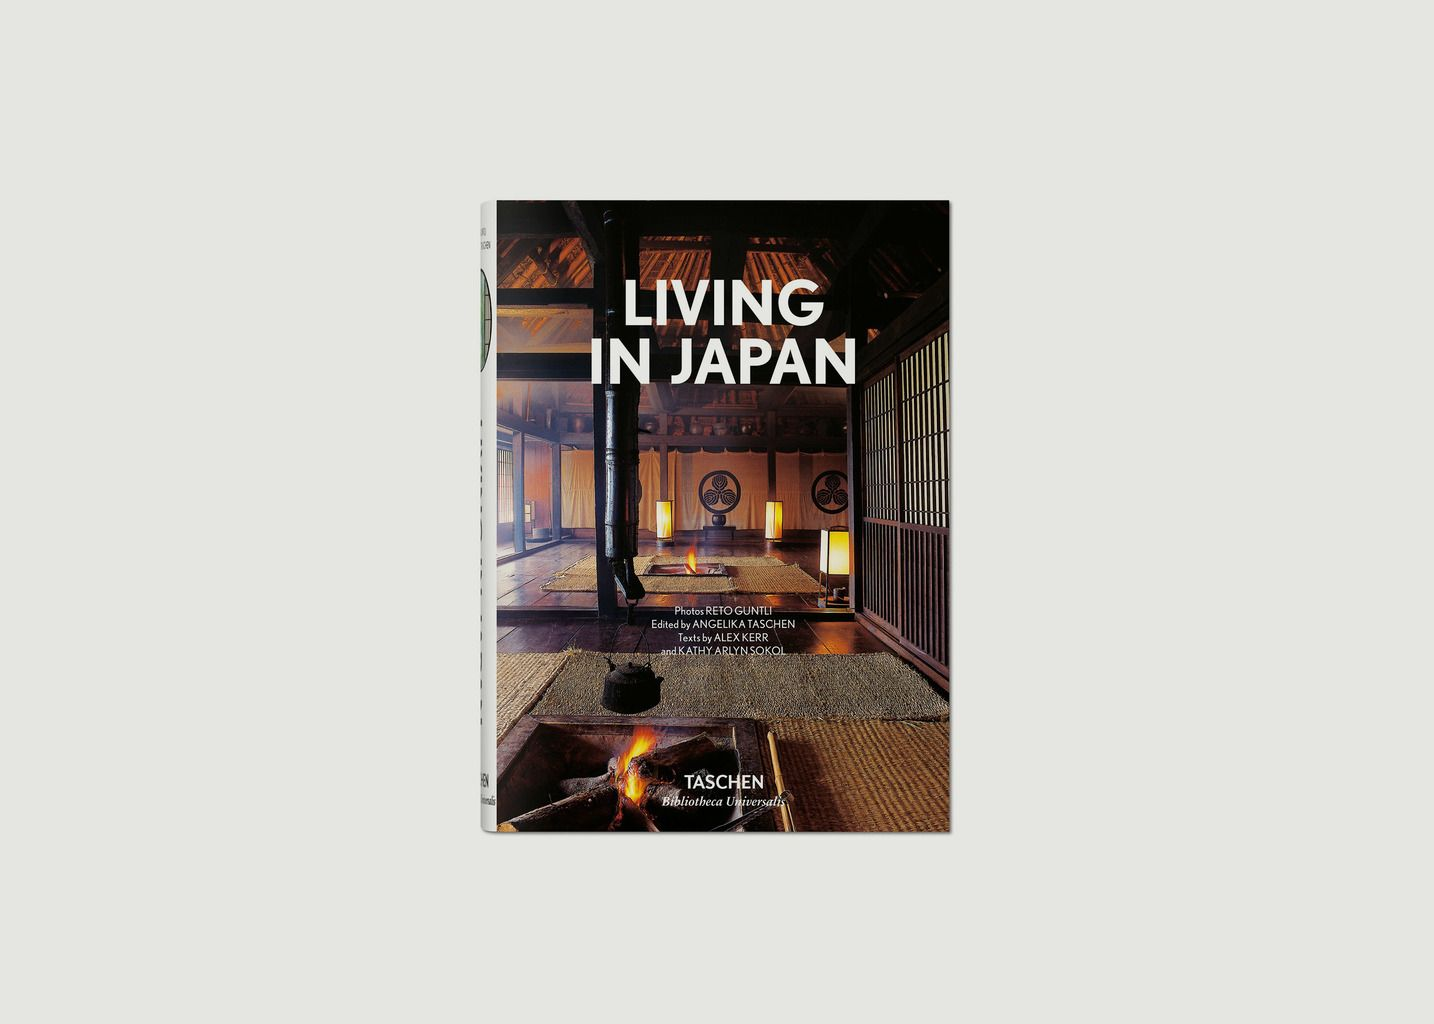 Livre Living in Japan - Taschen